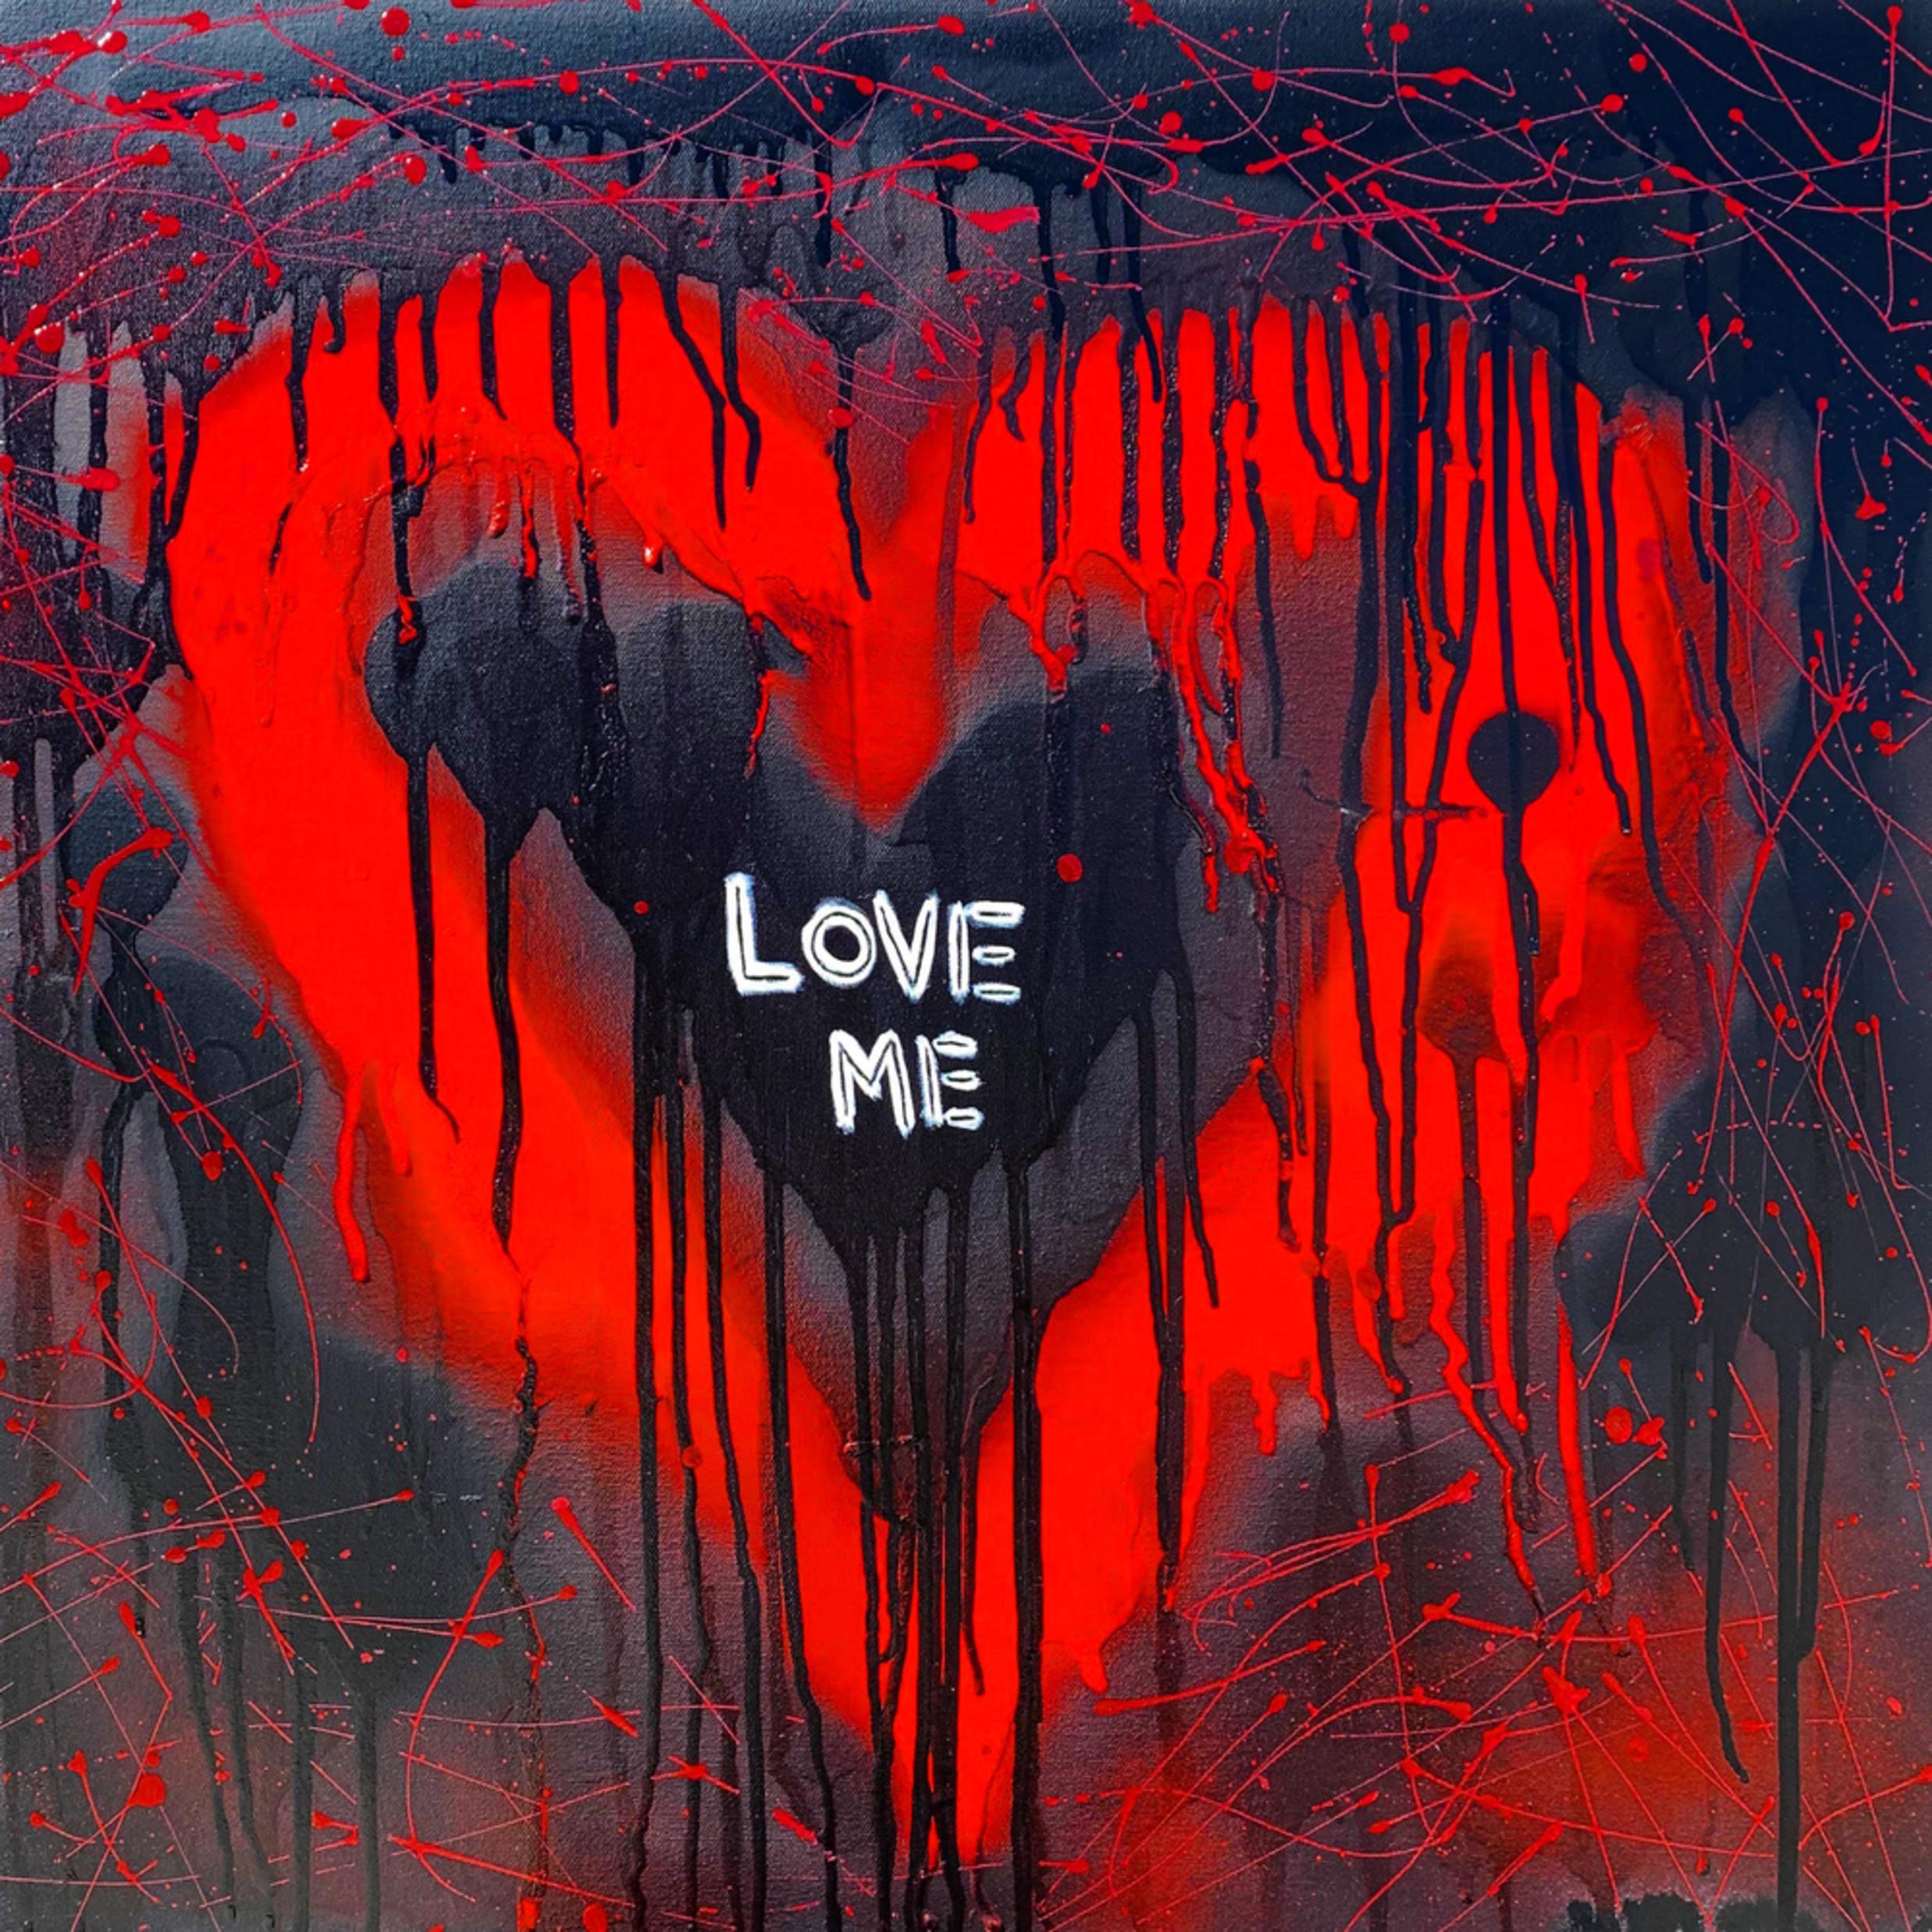 Love me drip heart pop art painting artist paul zepeda e9r0x2